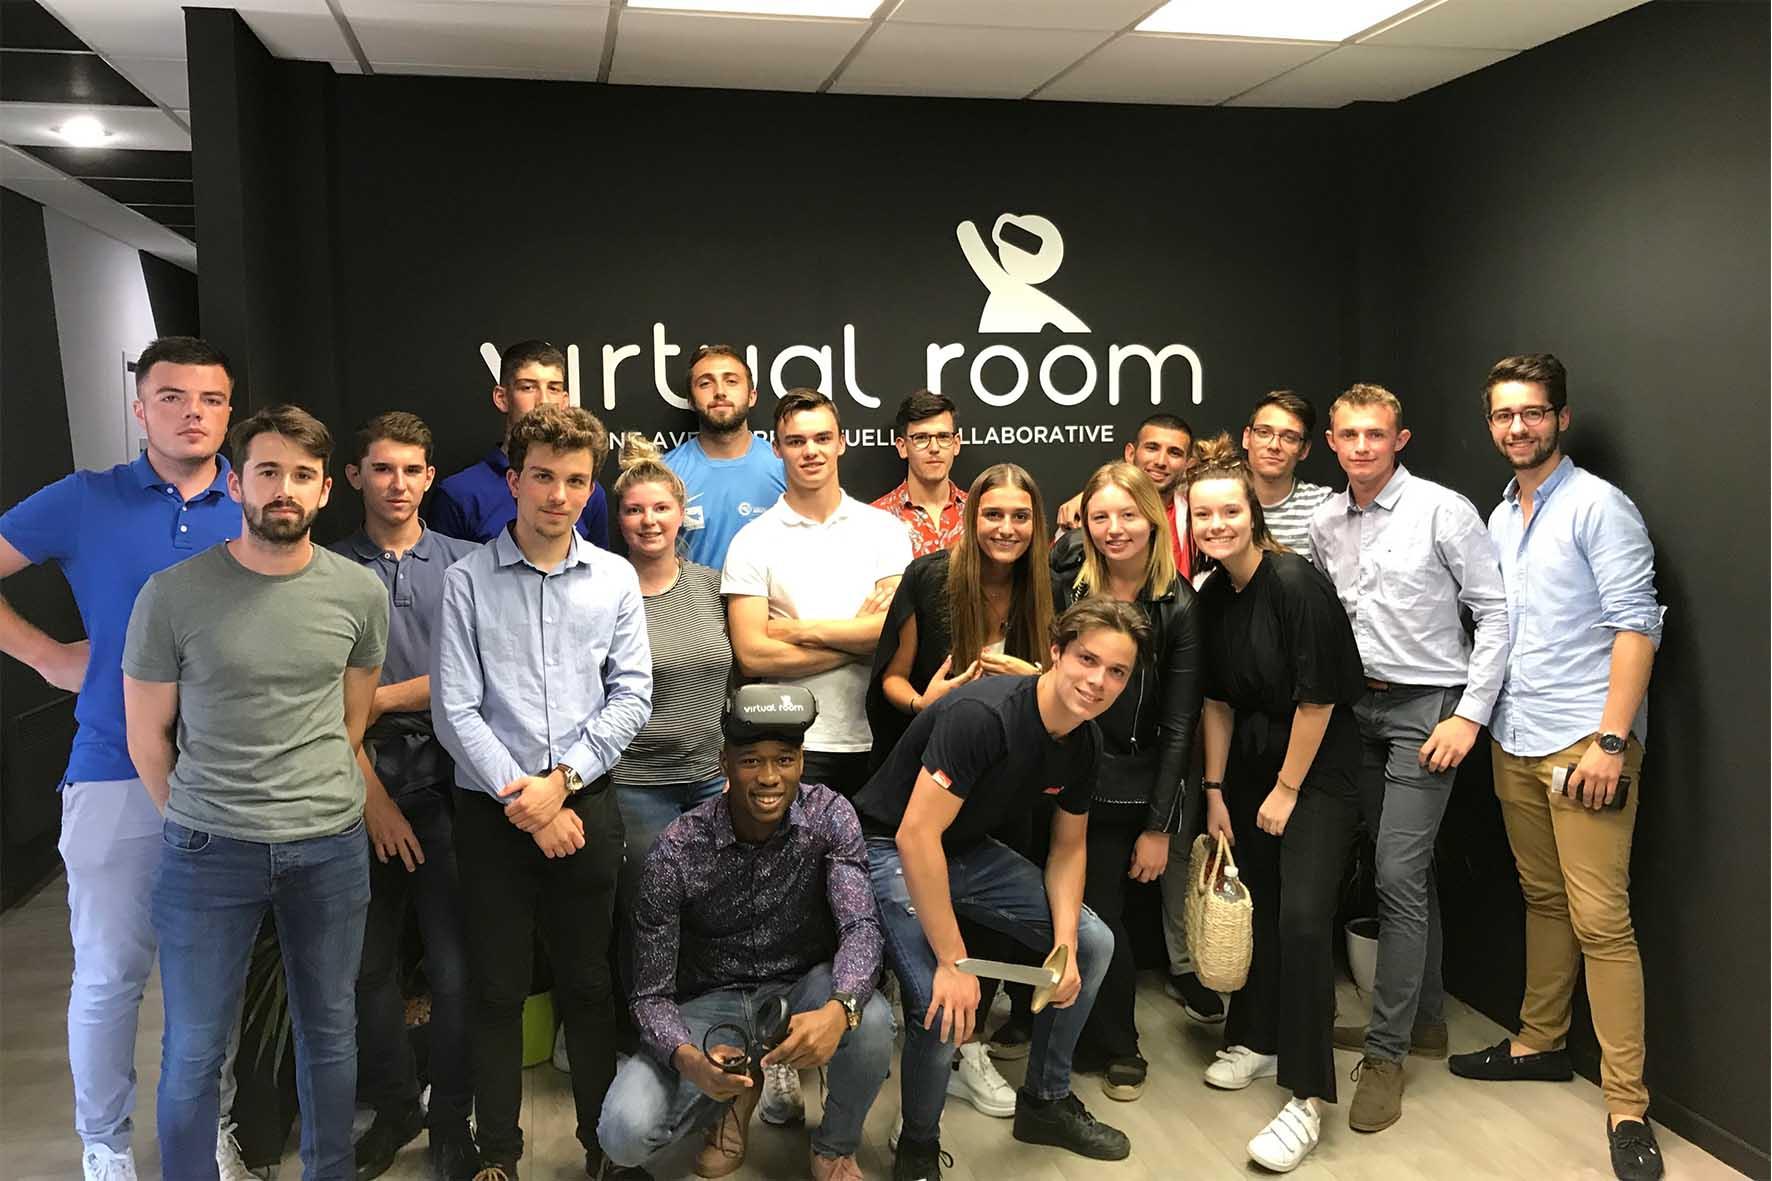 Virtual room Rennes